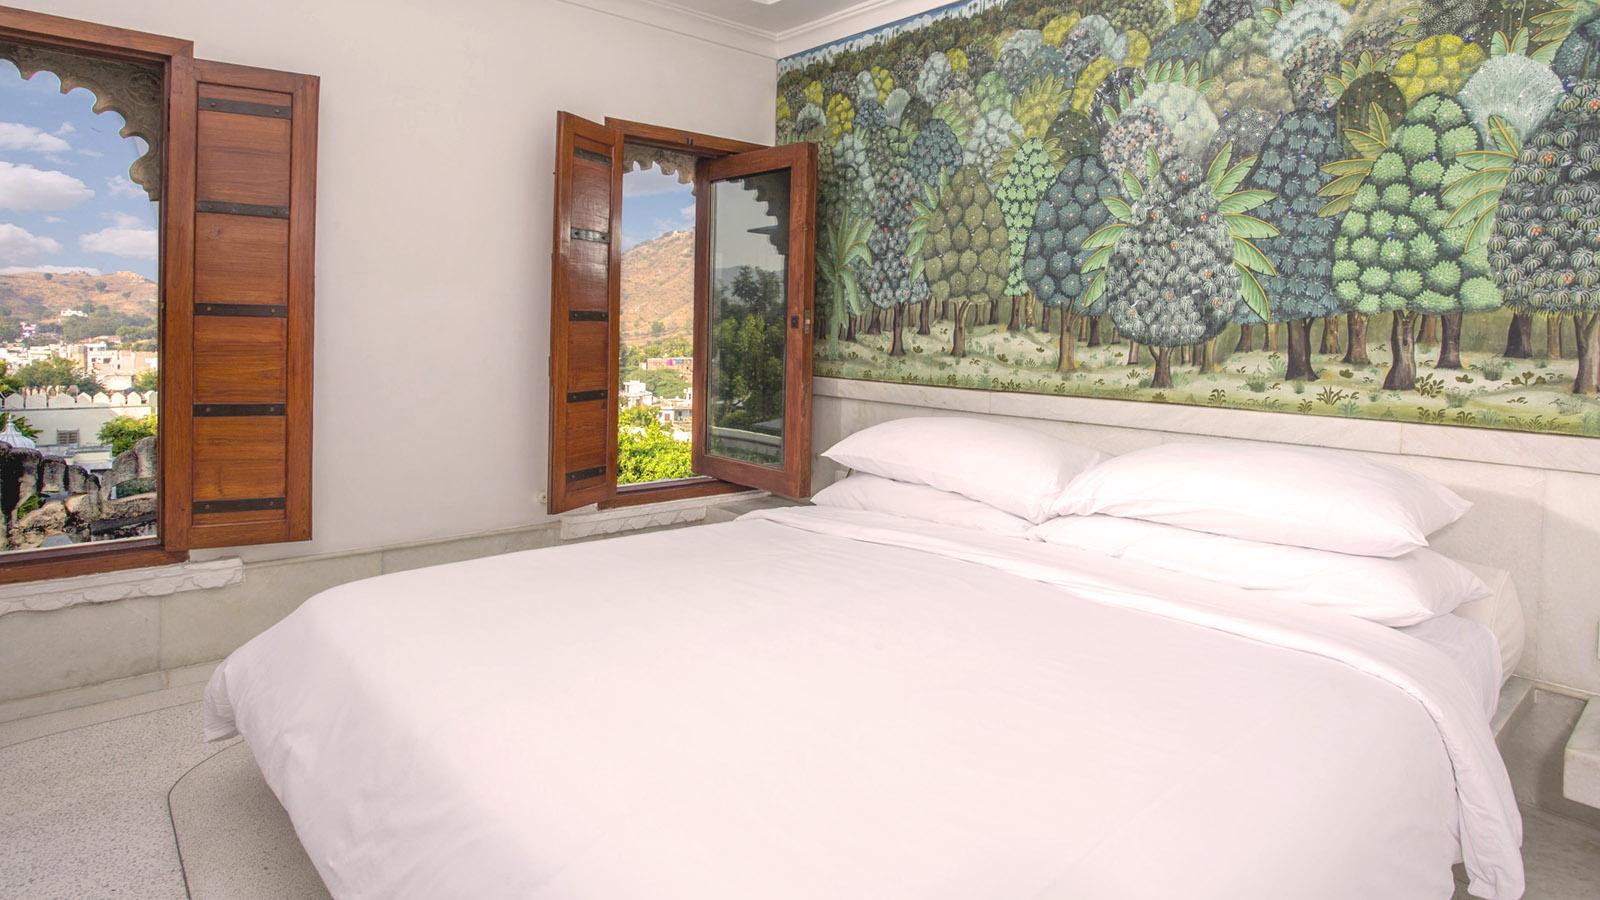 Palace-Suite-RAAS-Hotel-devigarh-Rajasthan-03